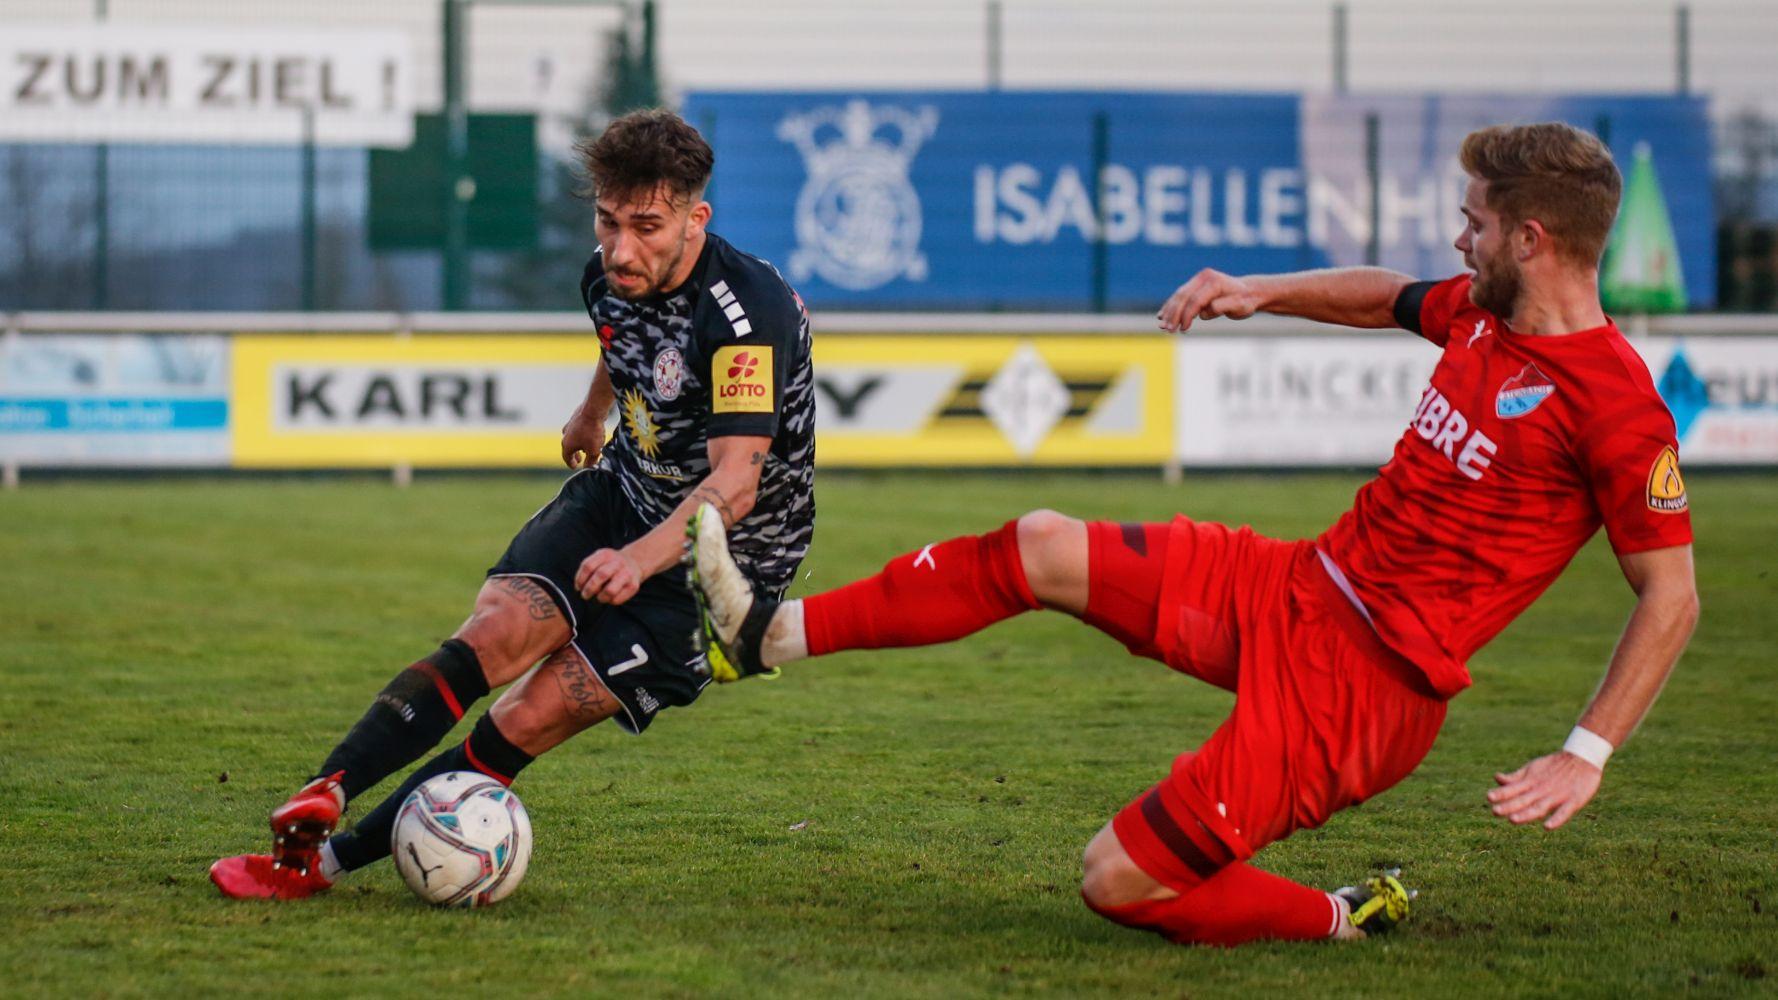 Sascha Marquet TSV Steinbach Haiger Nick Fingerhut